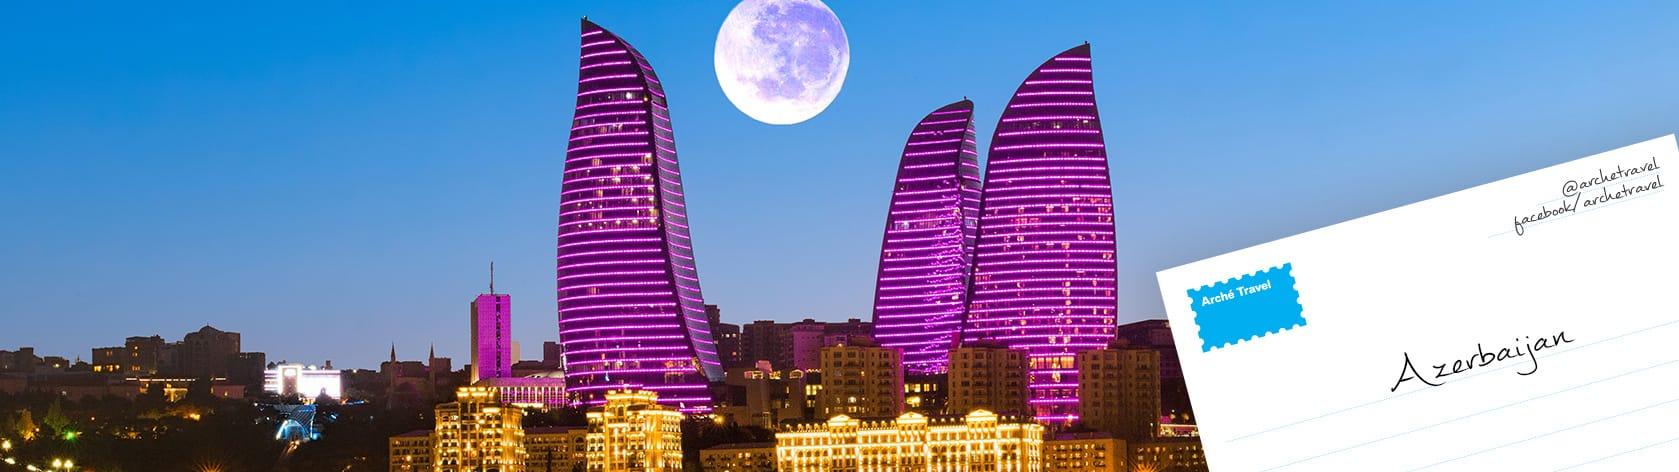 Blog Azerbaijan - Guida di Viaggio Azerbaijan - Blog di Viaggio Azerbaijan